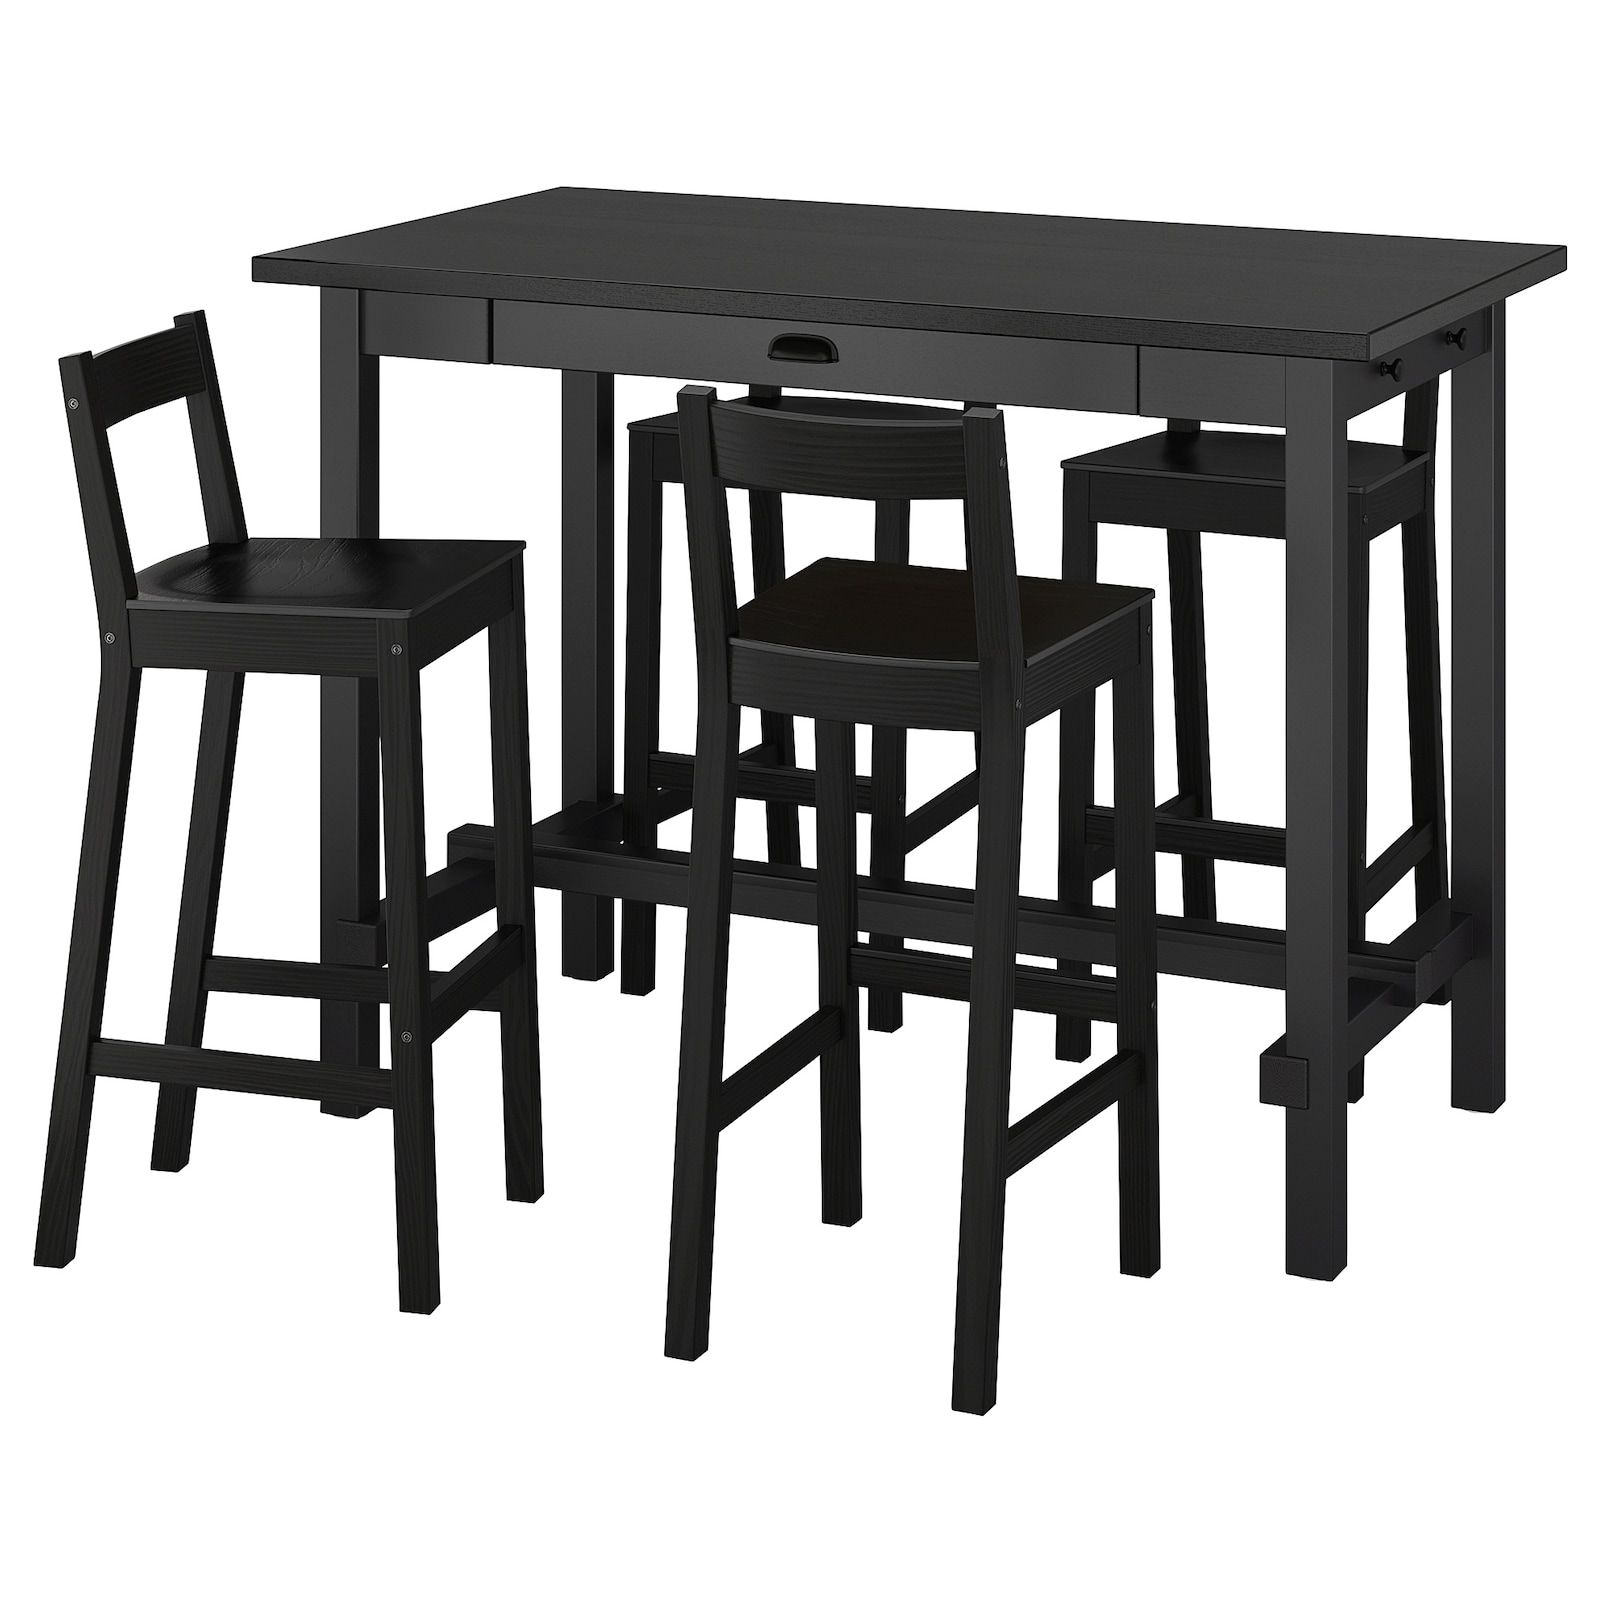 Nordviken Nordviken Bar Table And 4 Bar Stools Black Black Ikea In 2021 Bar Table Bar Stools Bar Table Sets